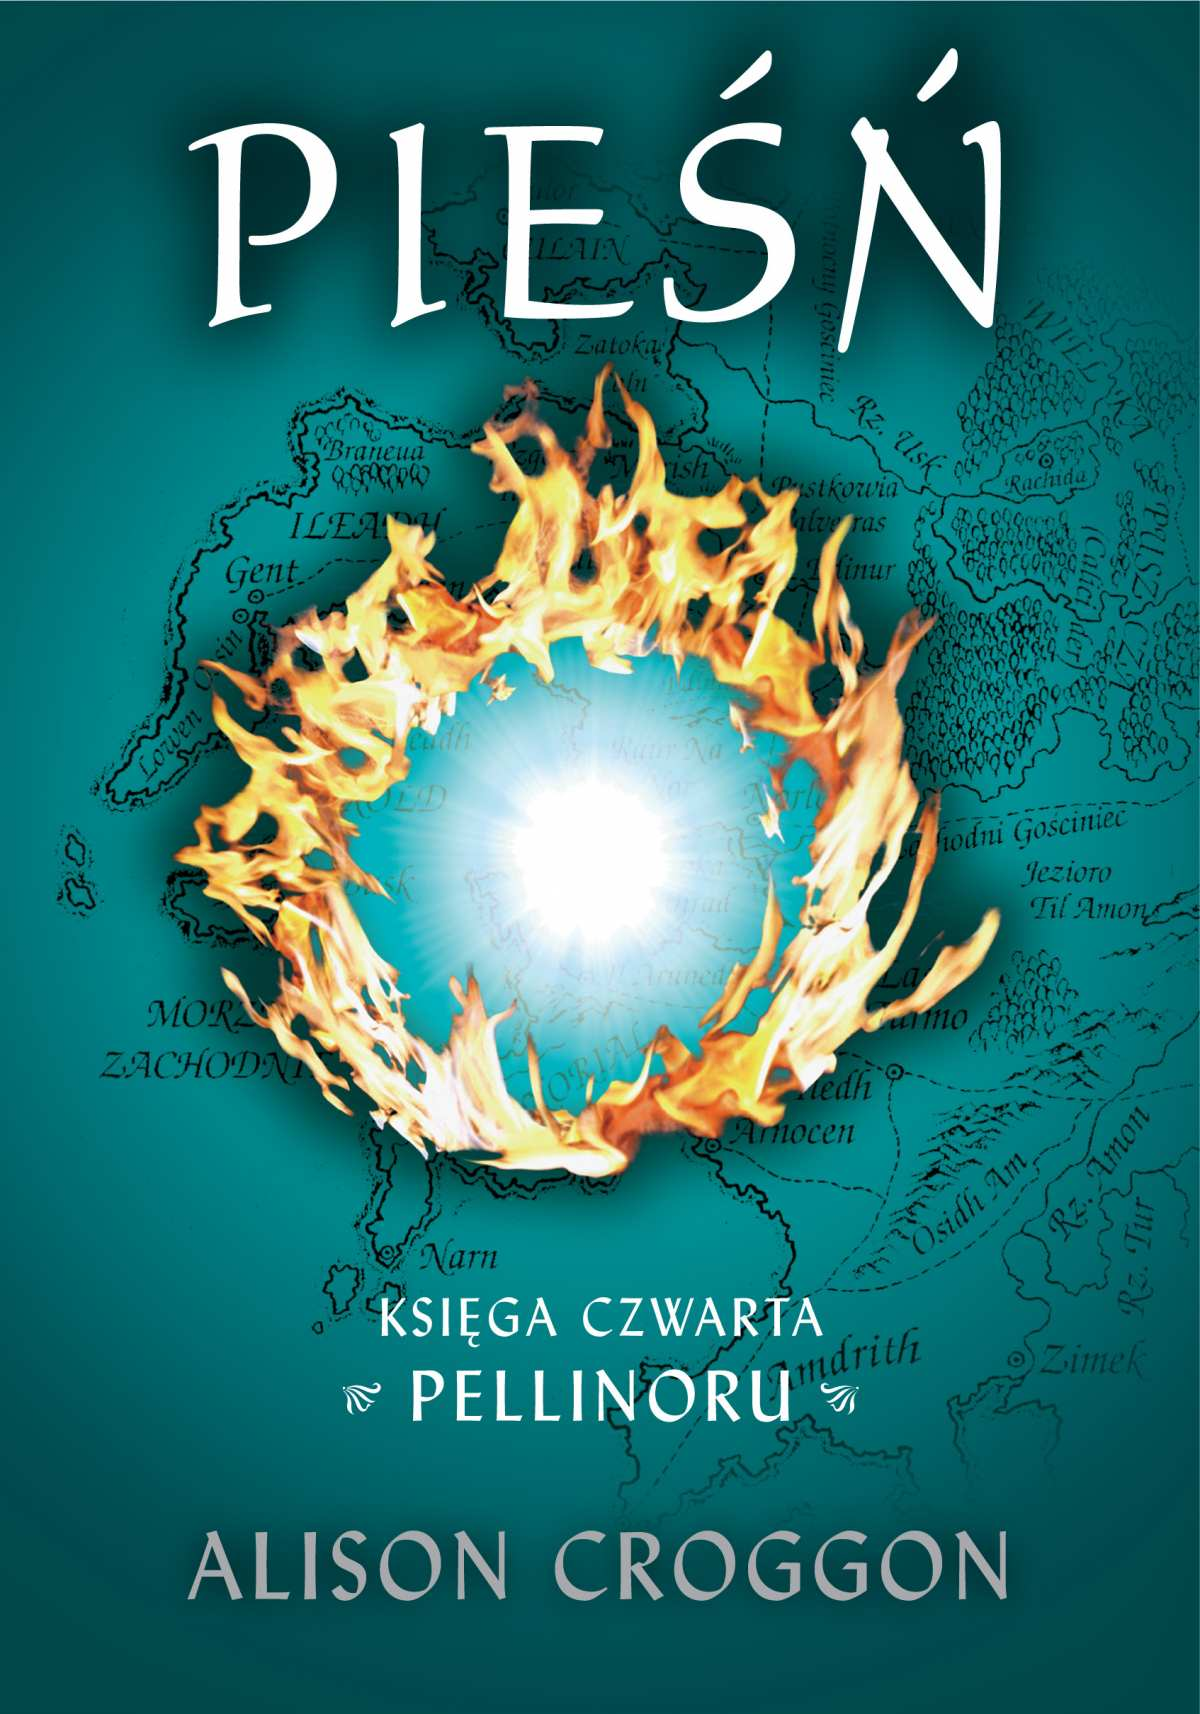 Pieśń. Księga IV Pellinoru - Ebook (Książka EPUB) do pobrania w formacie EPUB